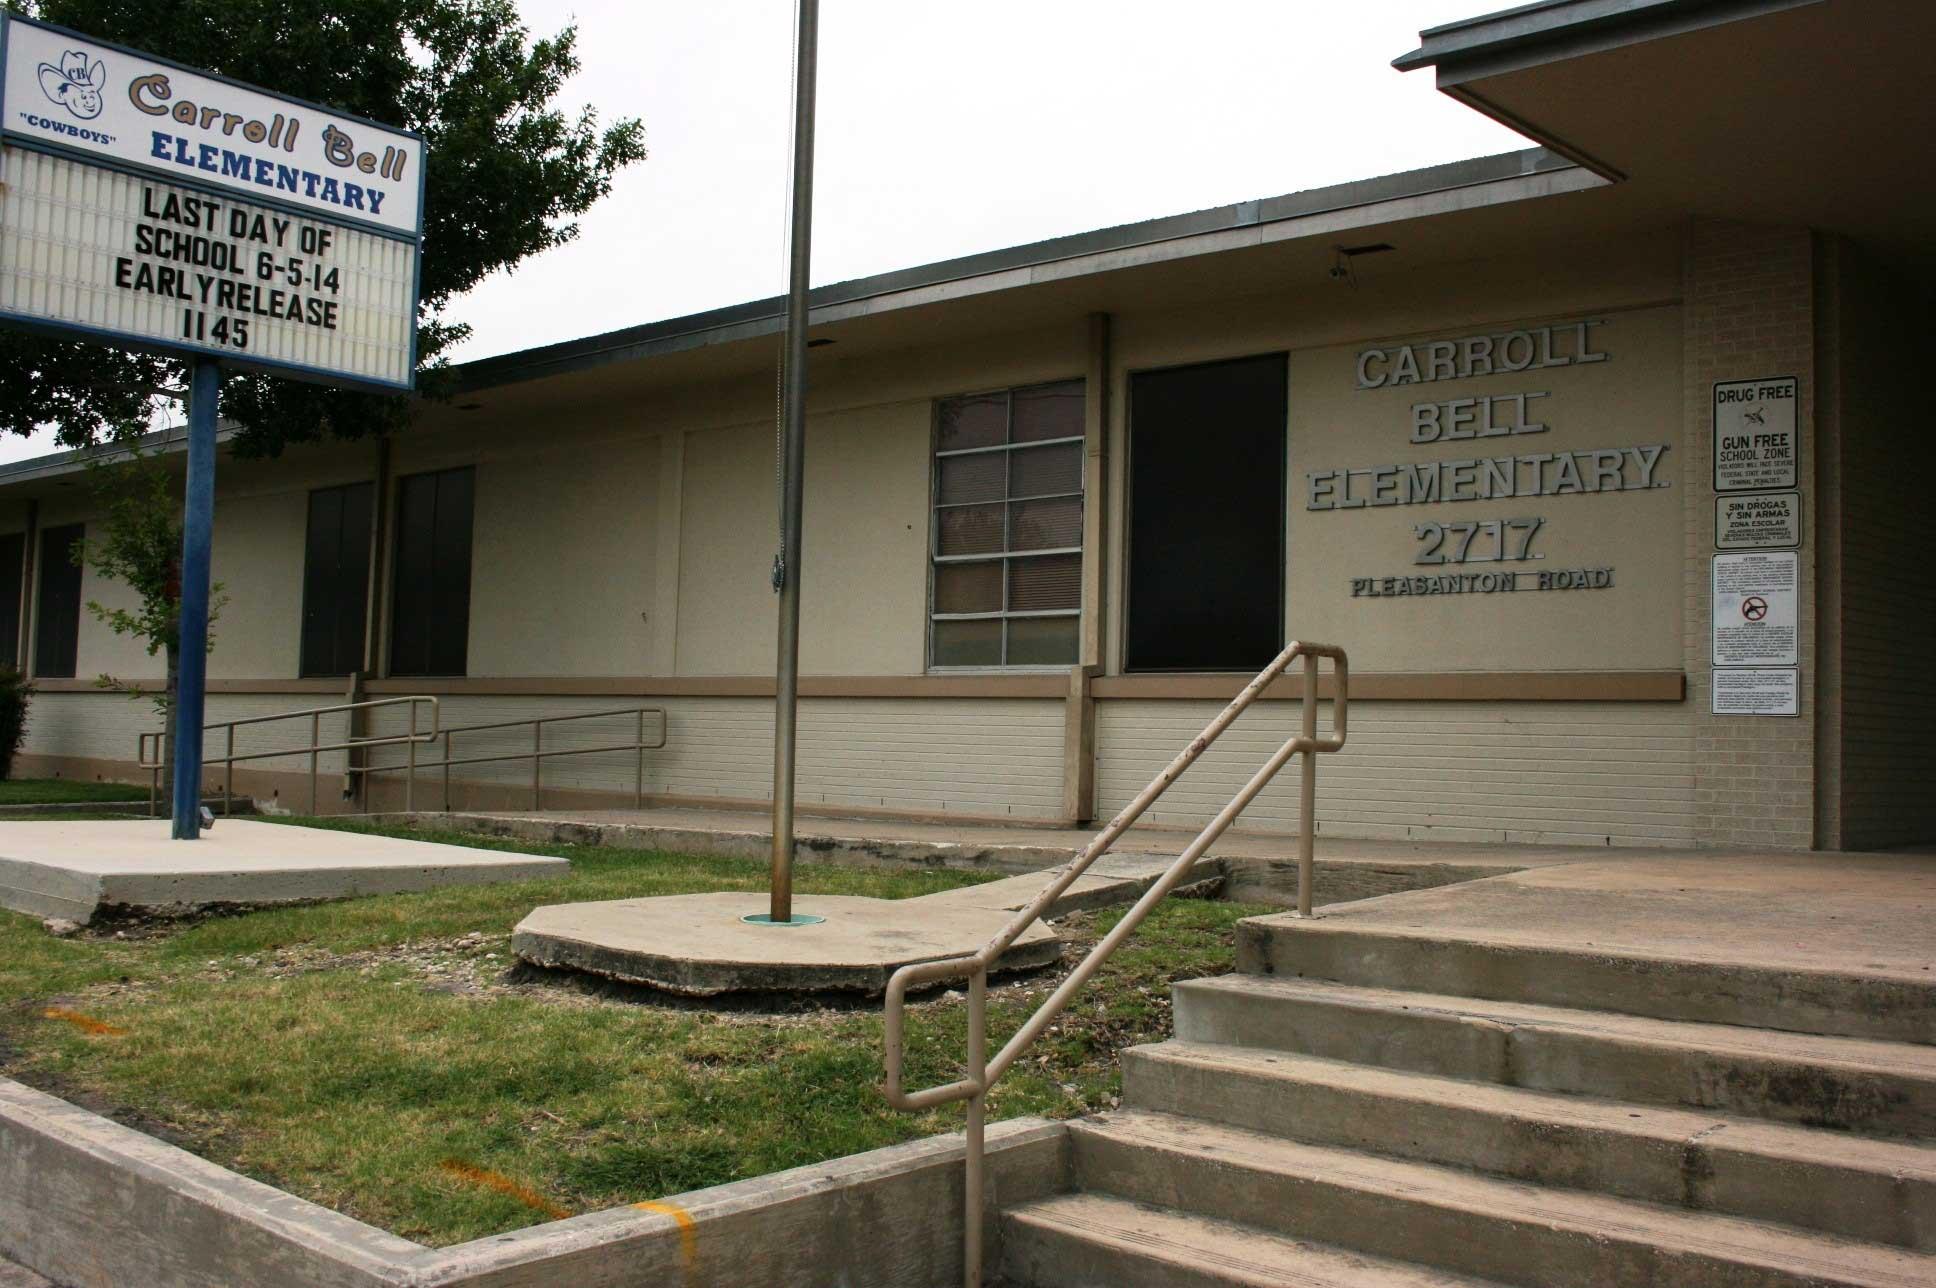 Carroll Bell Elementary School